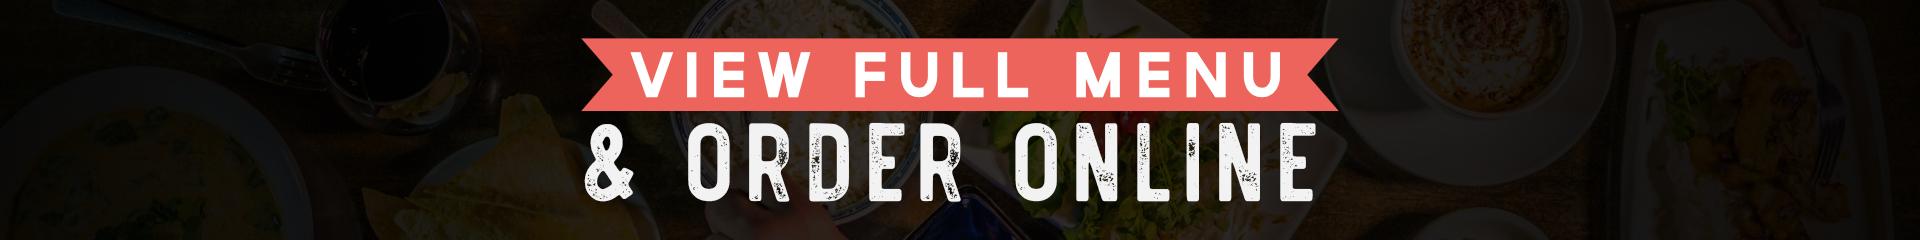 View our full menu & order online!